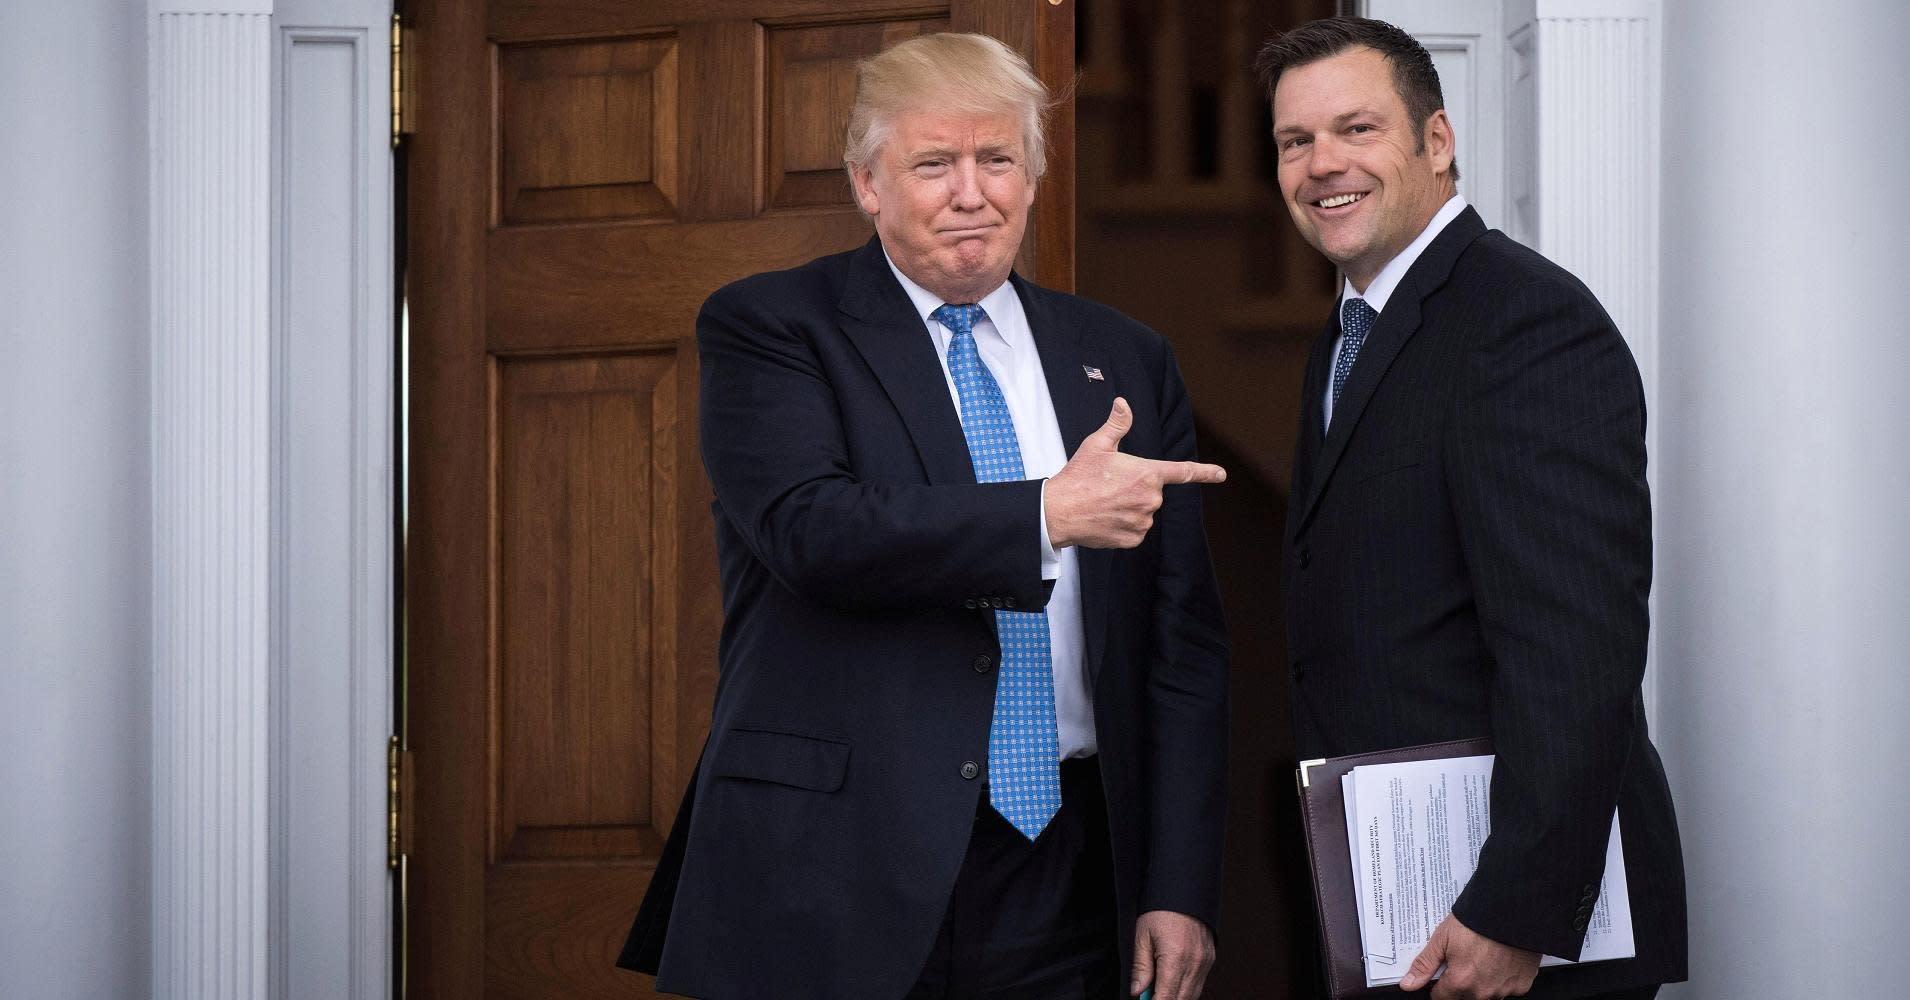 Trump advisor accidentally reveals hardline immigration plans to photographers